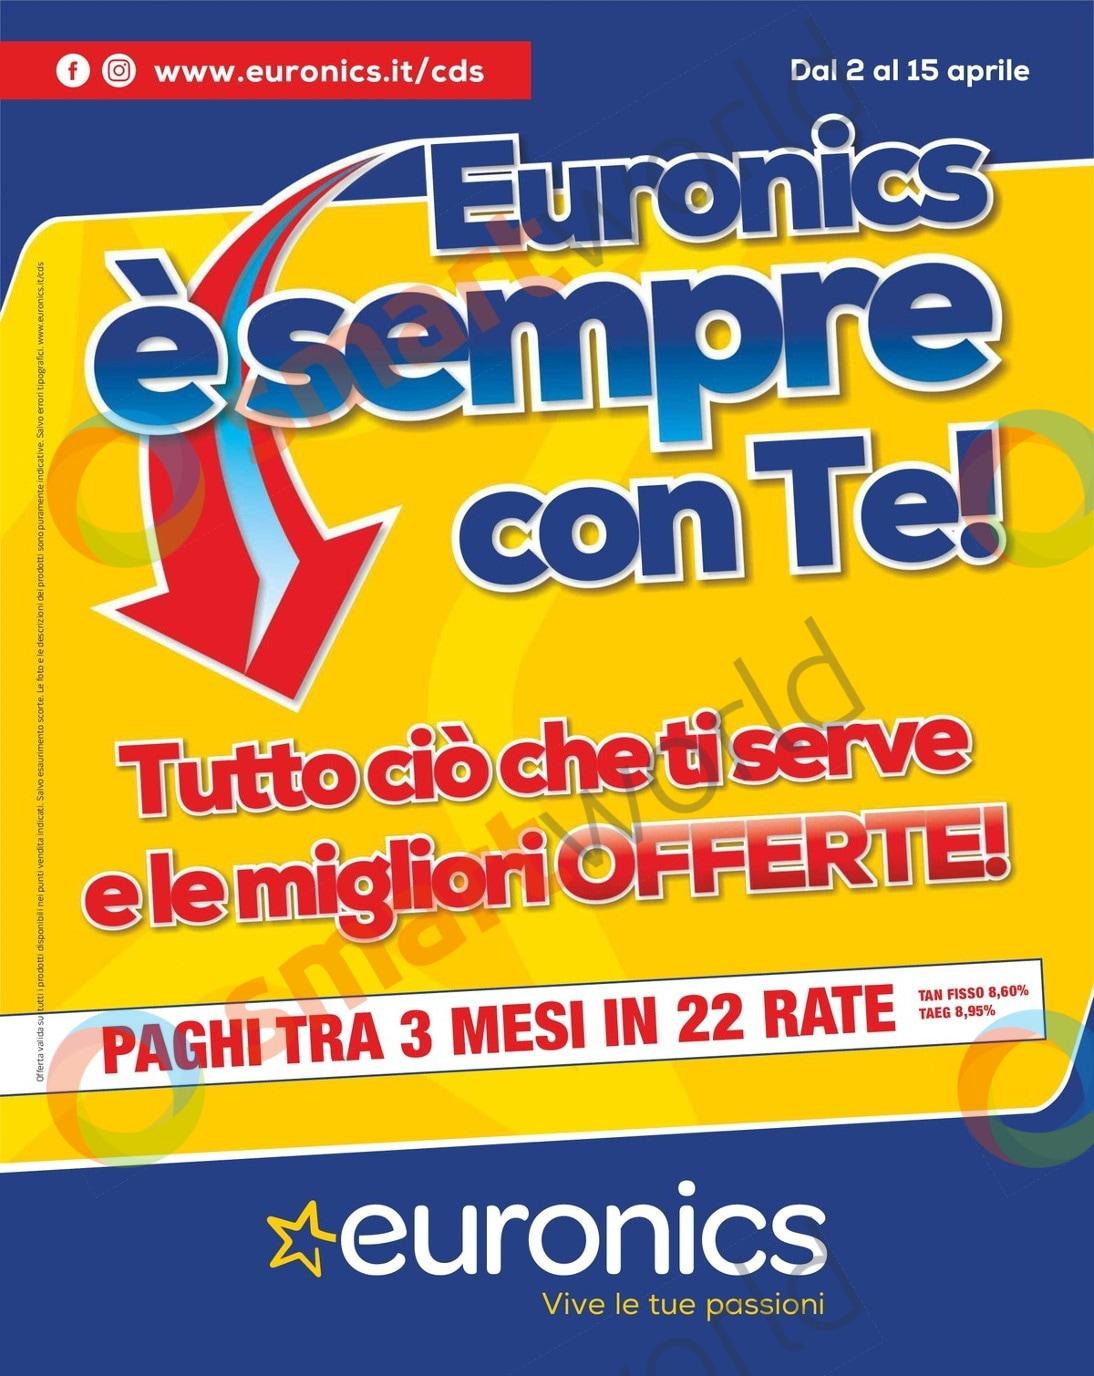 volantino euronics cds 2 15 aprile 2020 (1)